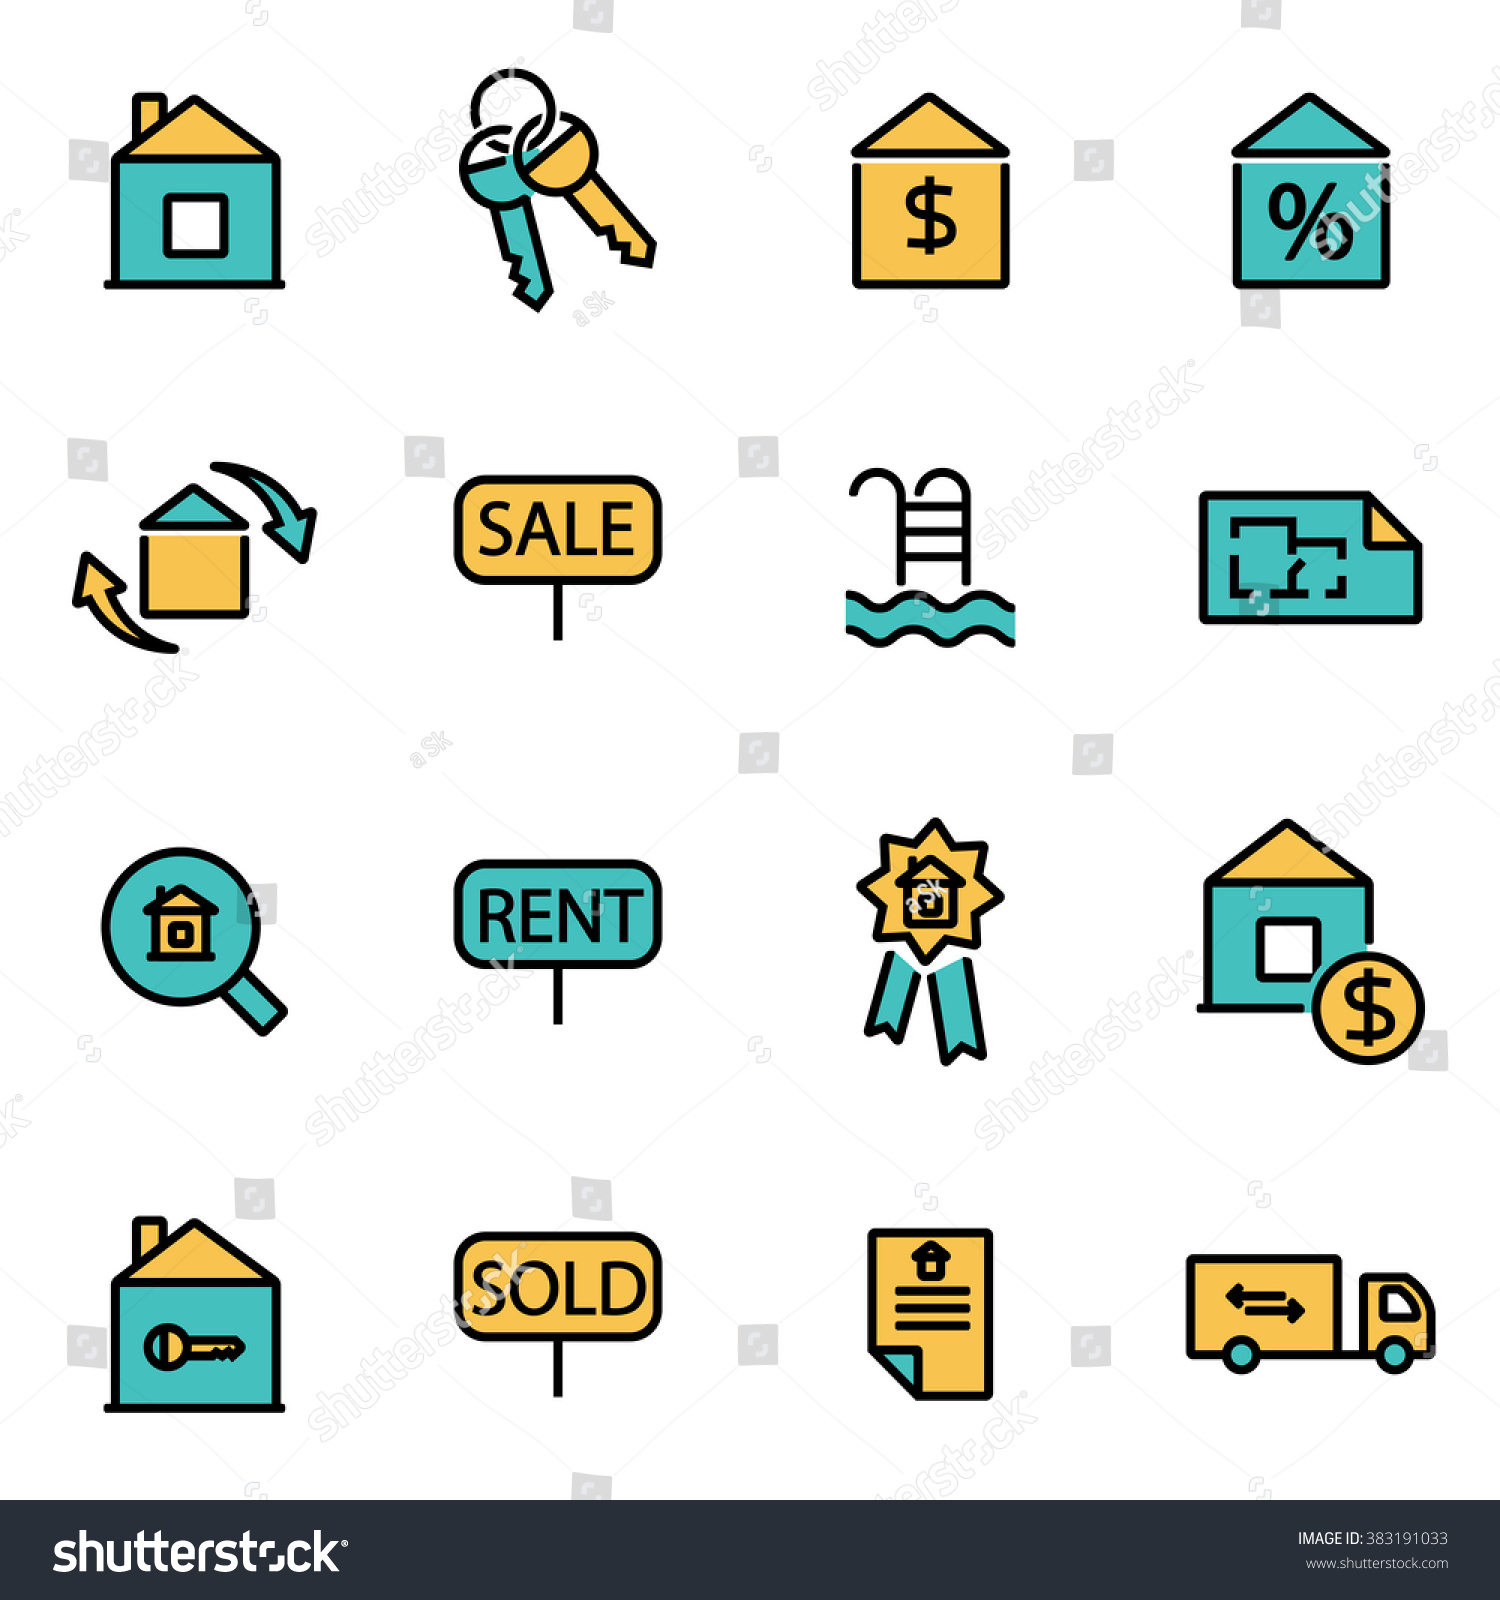 Real Estate Development Icon : Trendy flat line icon pack designers stock vector